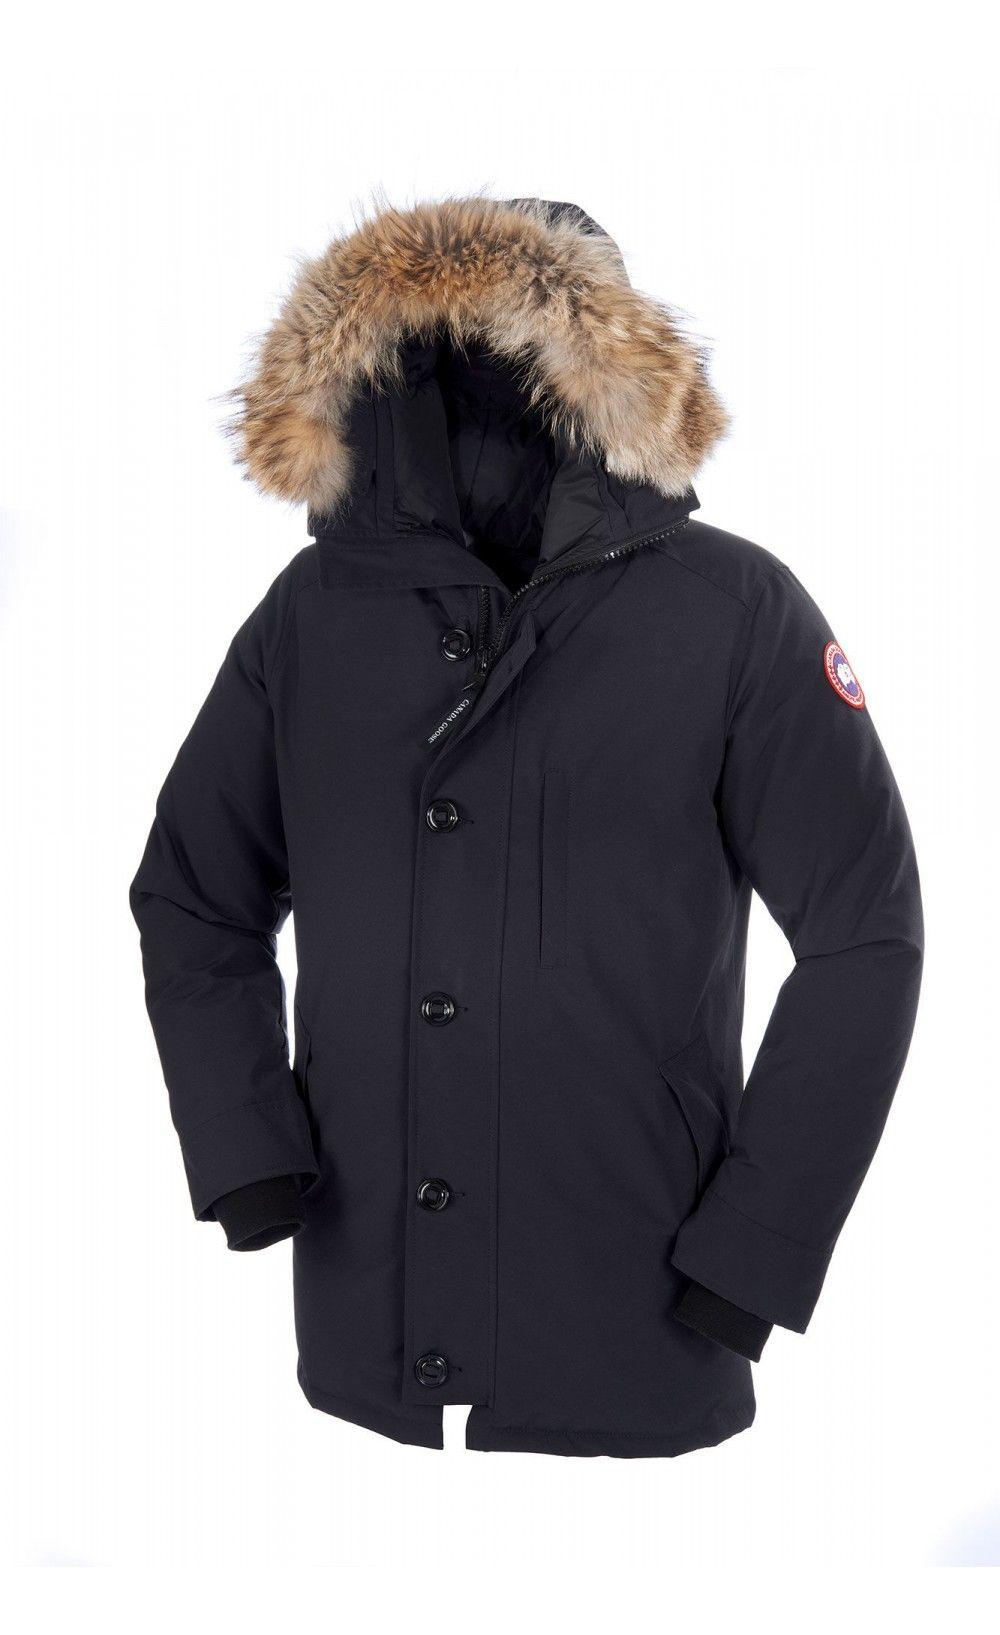 Canada Goose langford parka online discounts - Canada Goose Chateau #Parka #Men Slate | Canada Goos Women ...